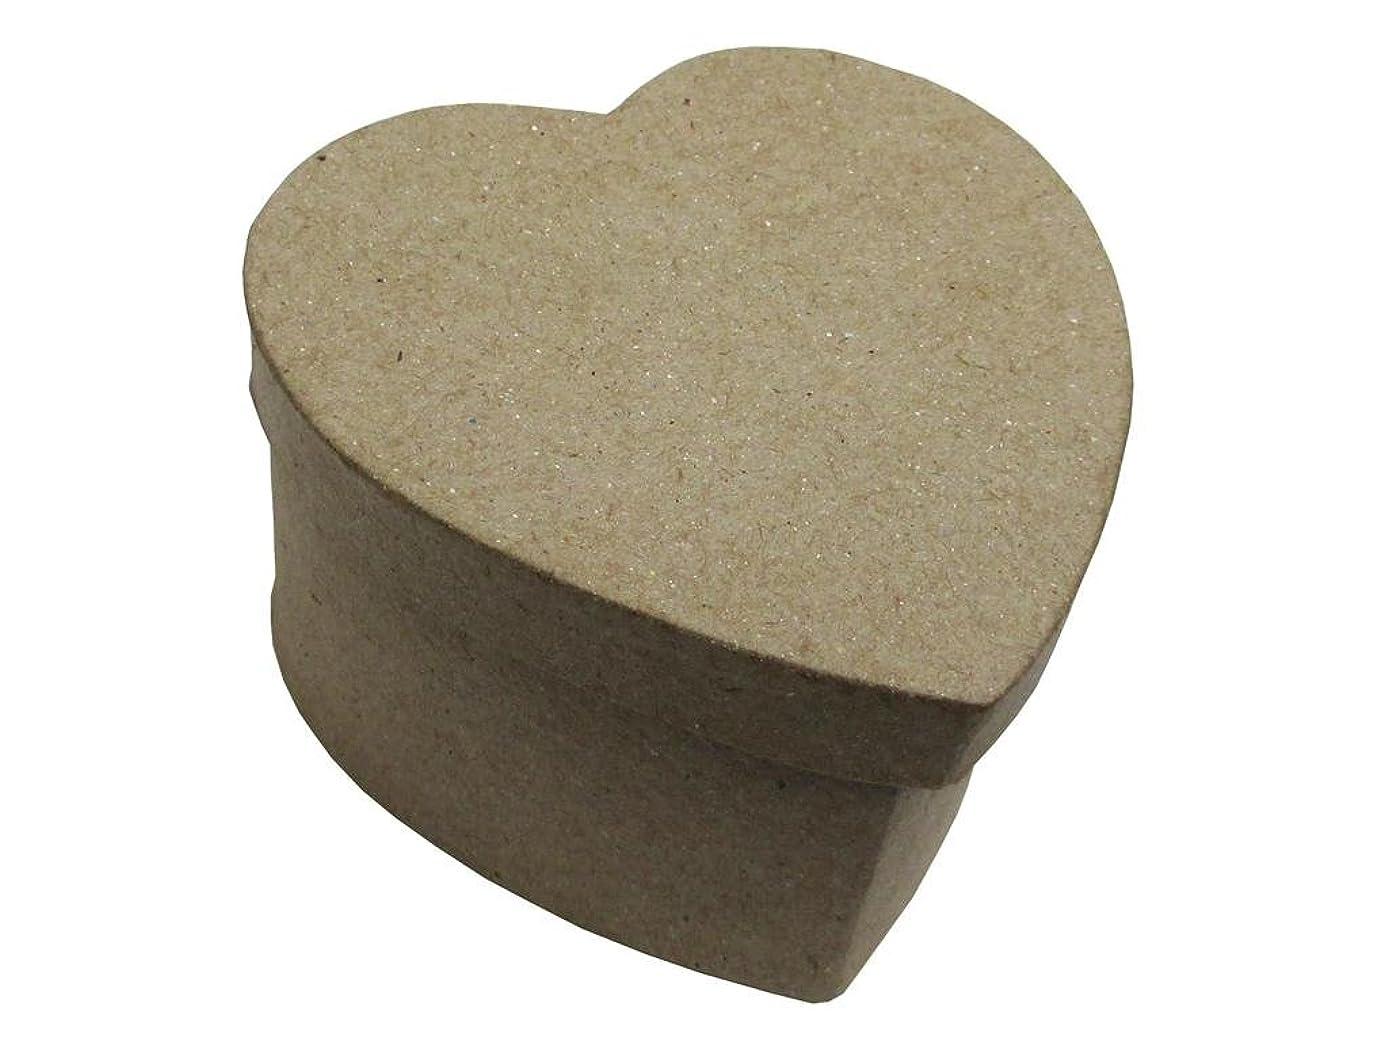 Craft Ped Paper CPLBV0124 Mache Box Mini Heart Kraft